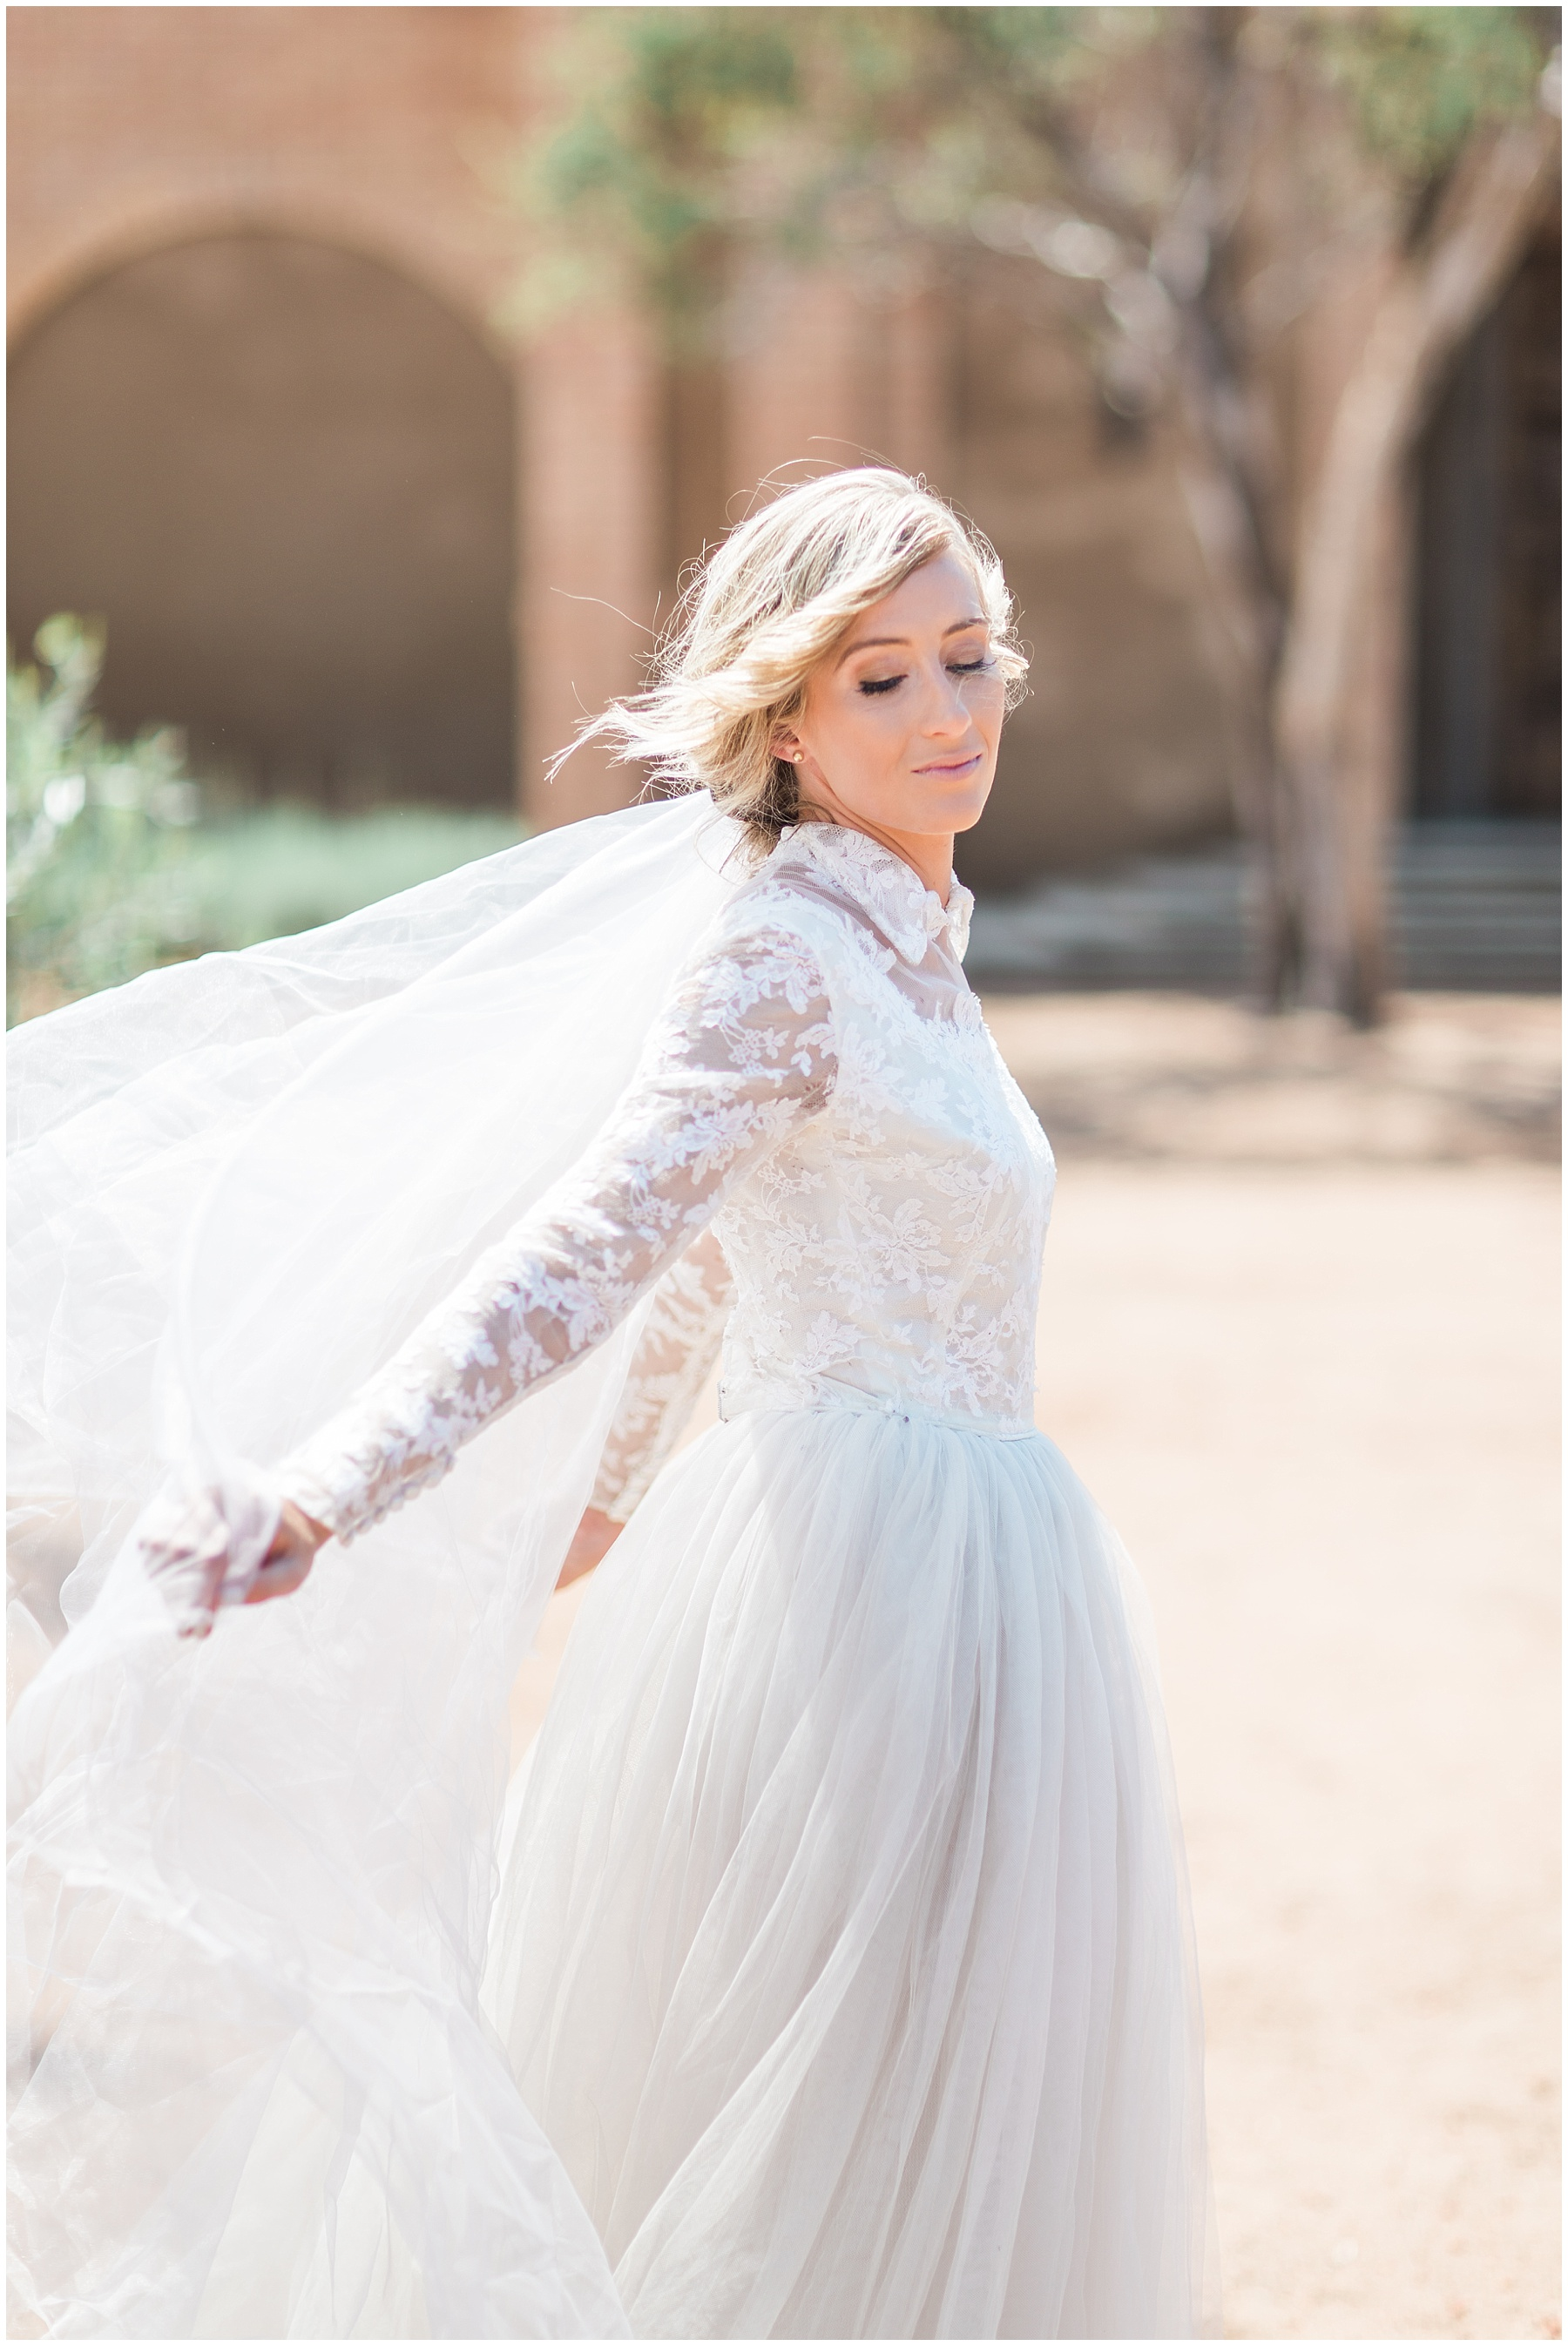 AliciaLandman_JoleneandZander_Wedding_The Pretty Blog_0443.jpg